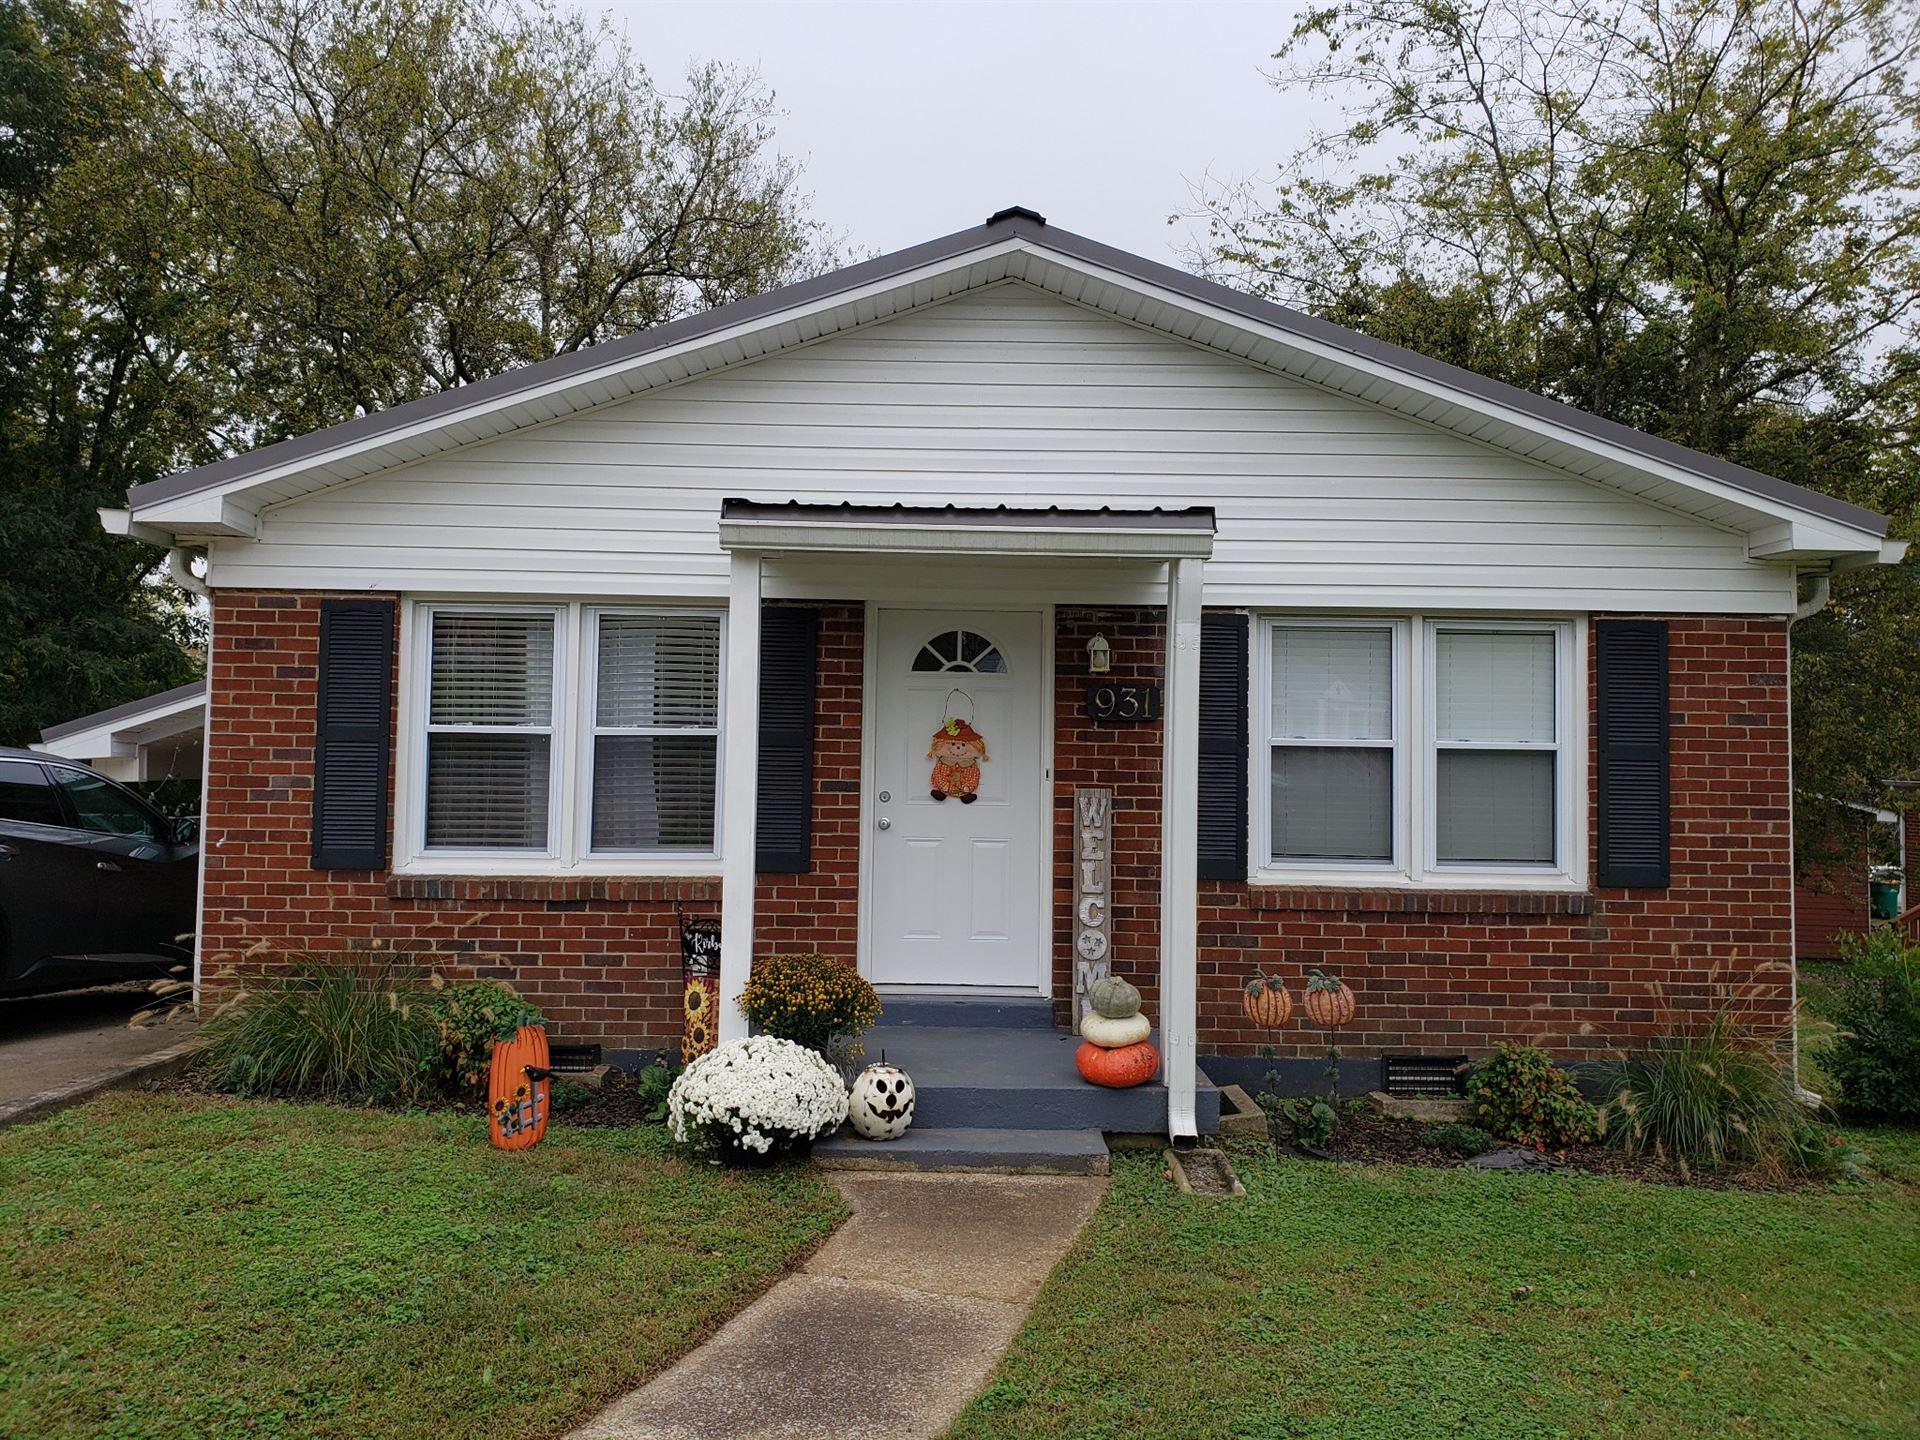 931 Florence St, Lewisburg, TN 37091 - MLS#: 2201865